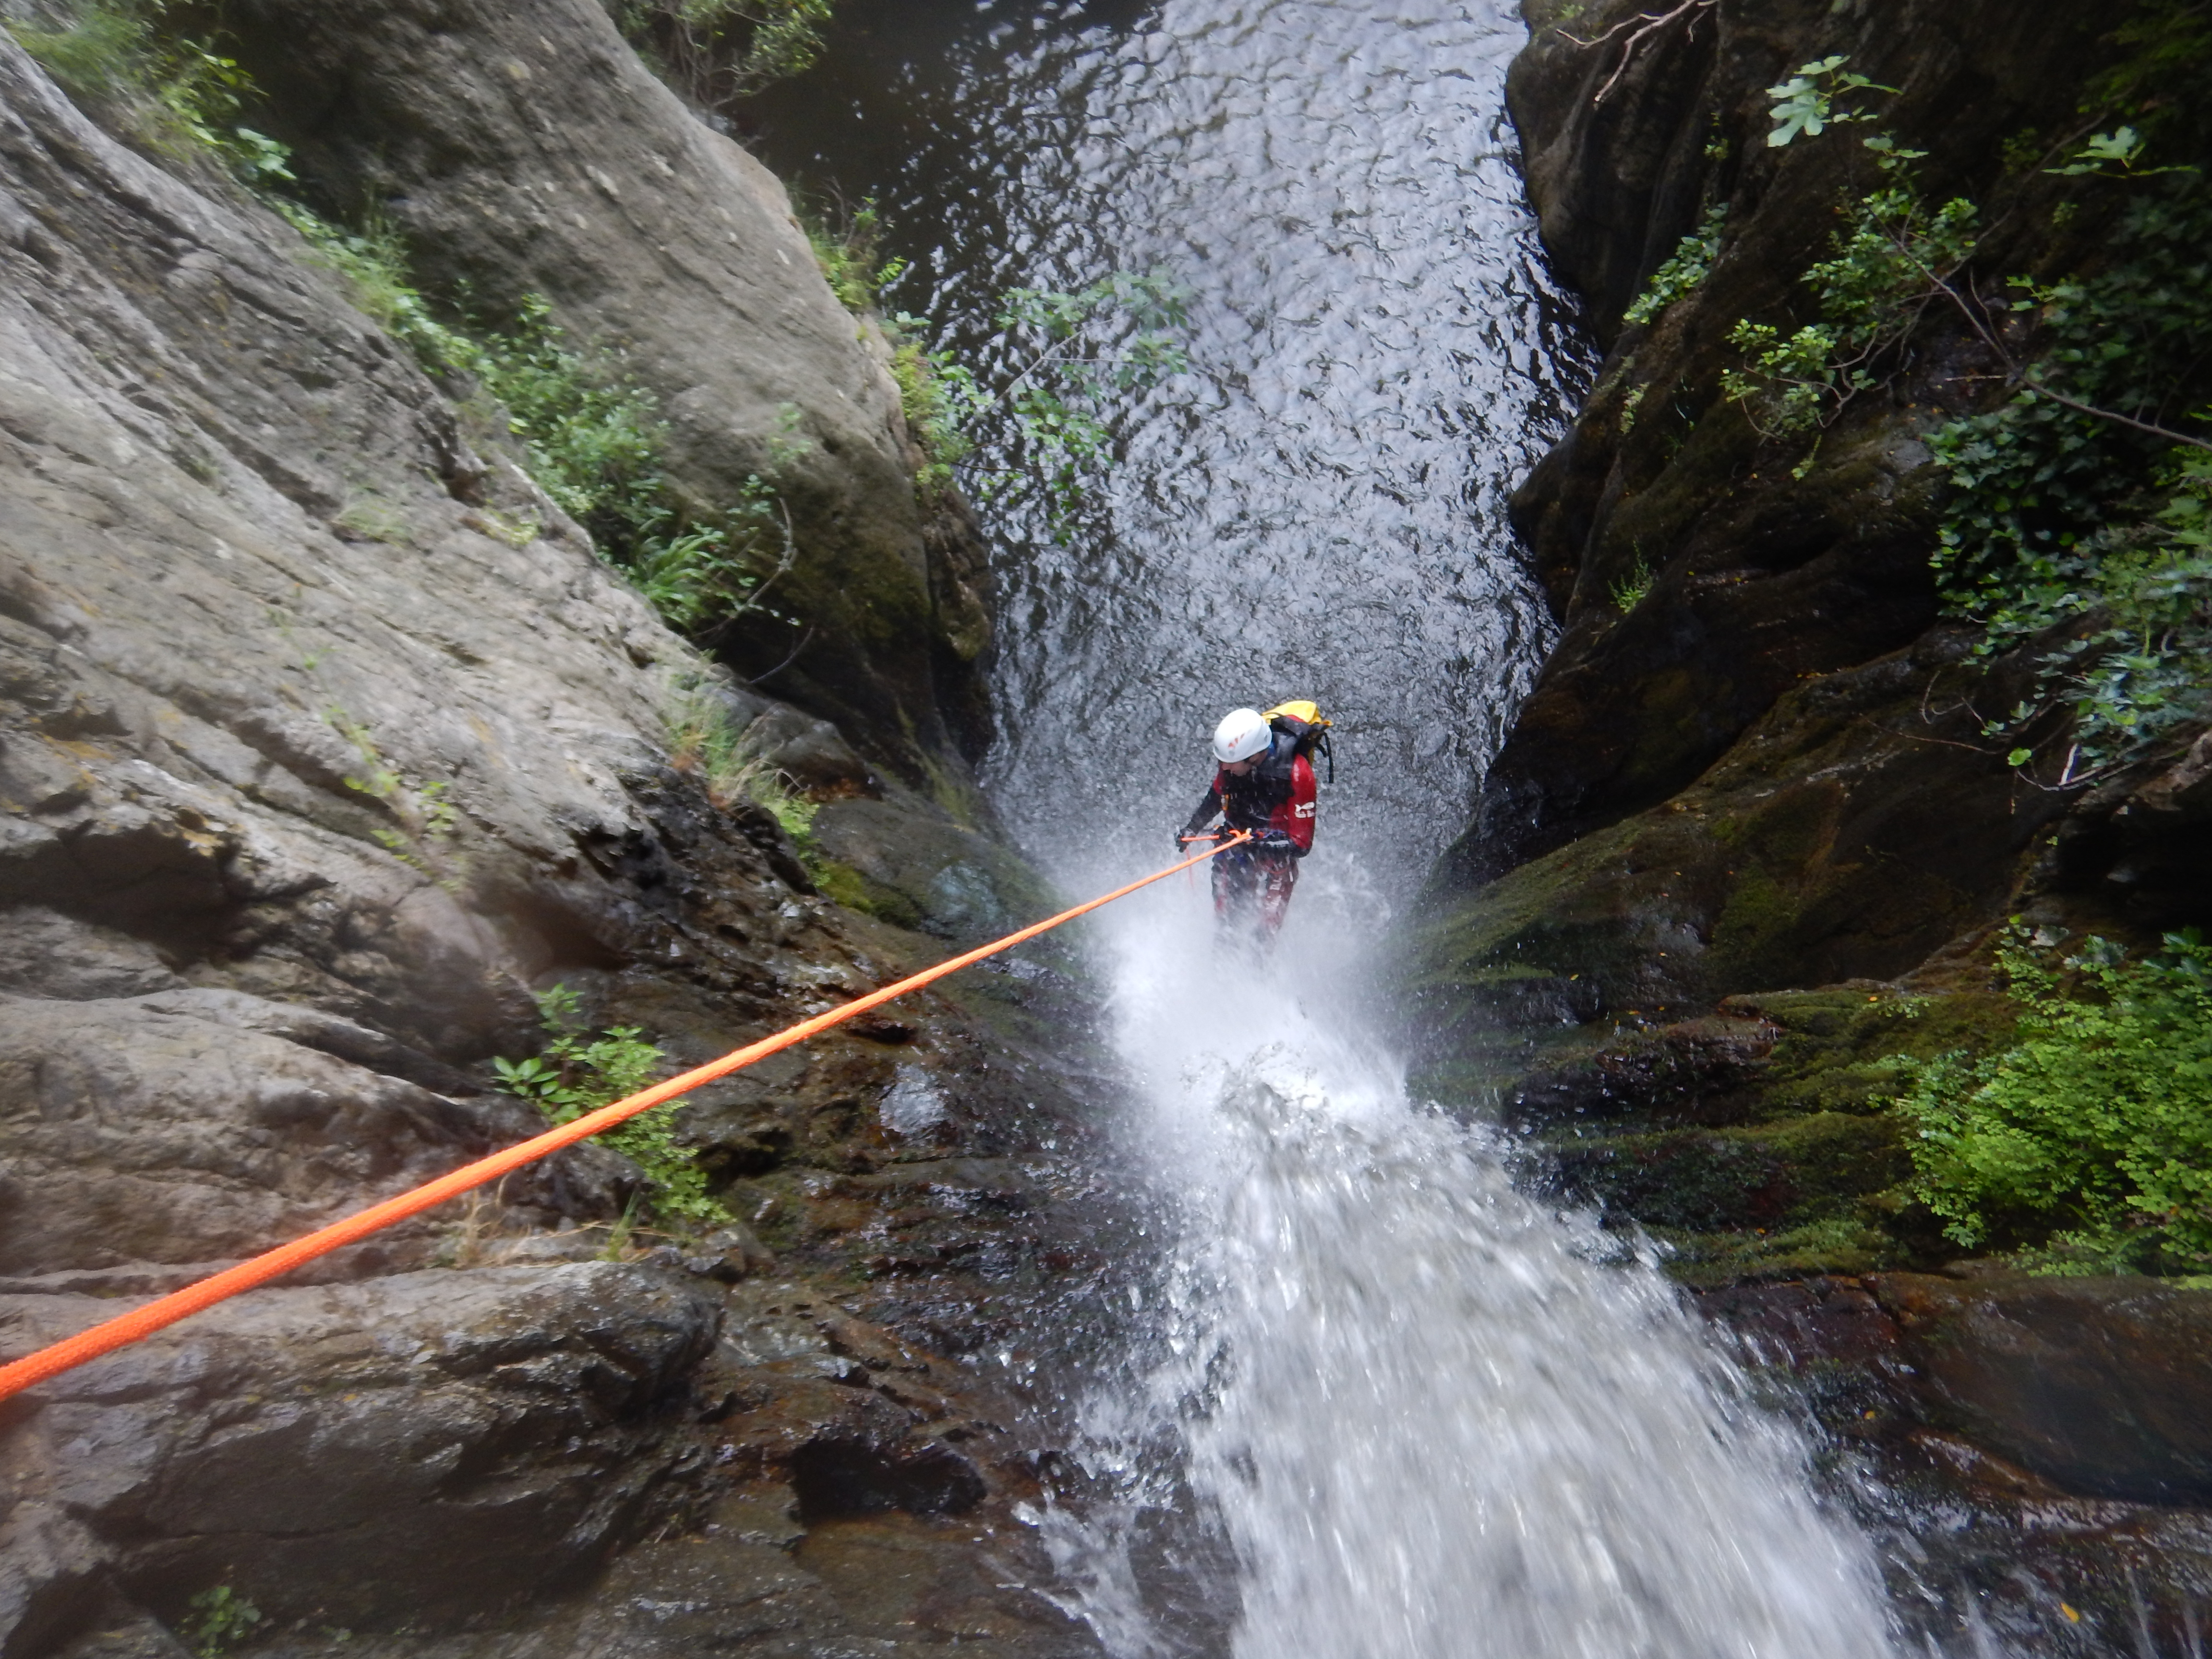 Canyoning Pyrénées orientales, canyon du Cady, canyon du mas calsan